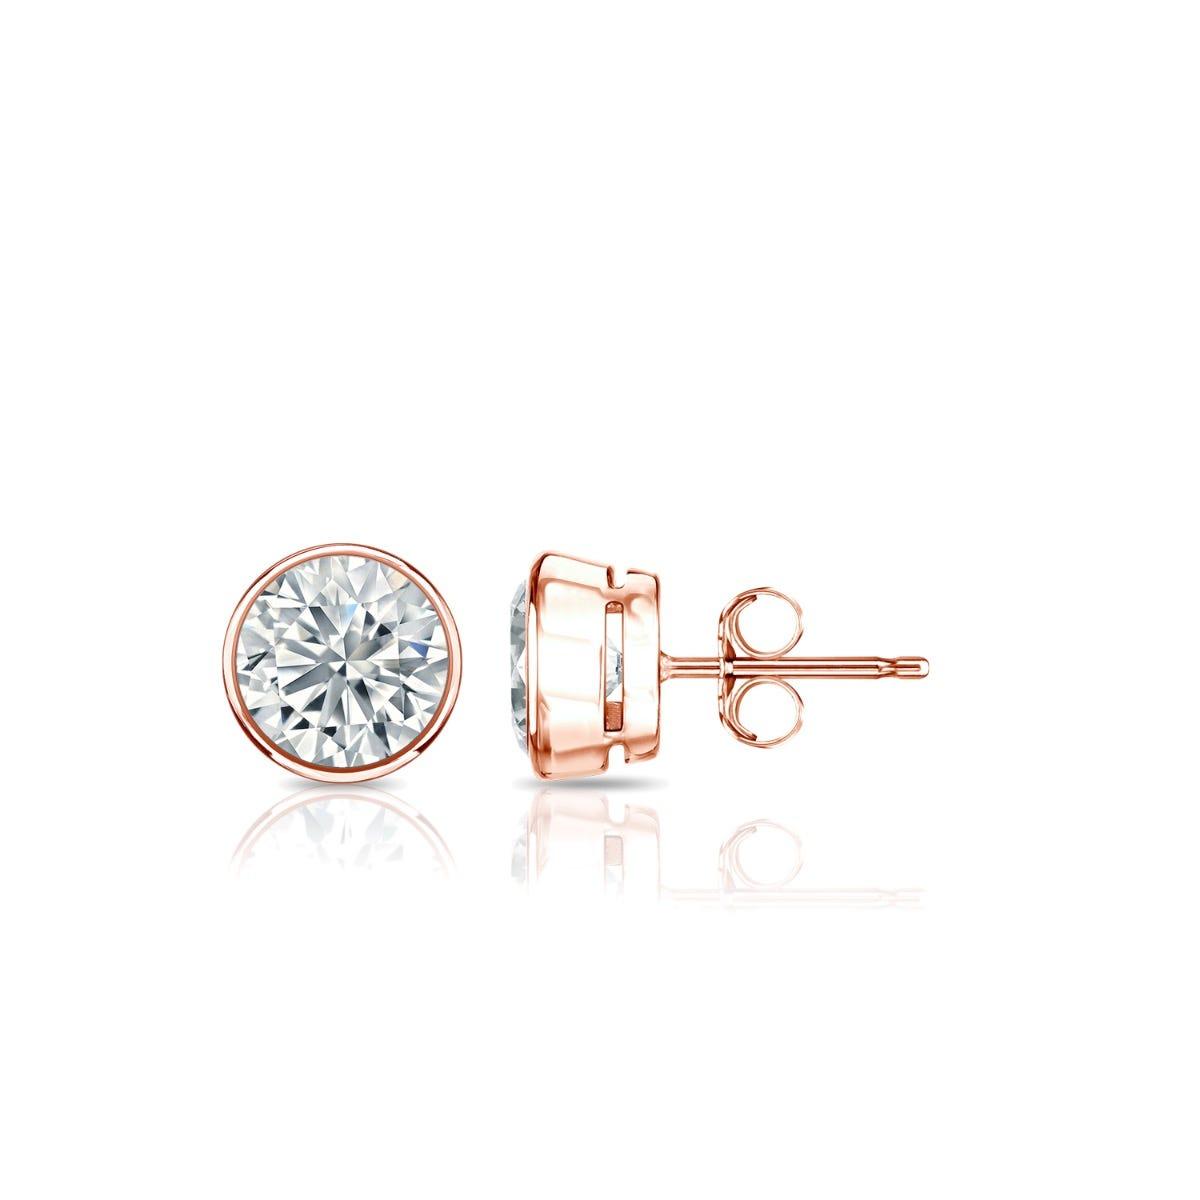 Diamond Round Bezel-Set 5/8ctw. Solitaire Stud (IJ-I2) Earrings in 10K Rose Gold